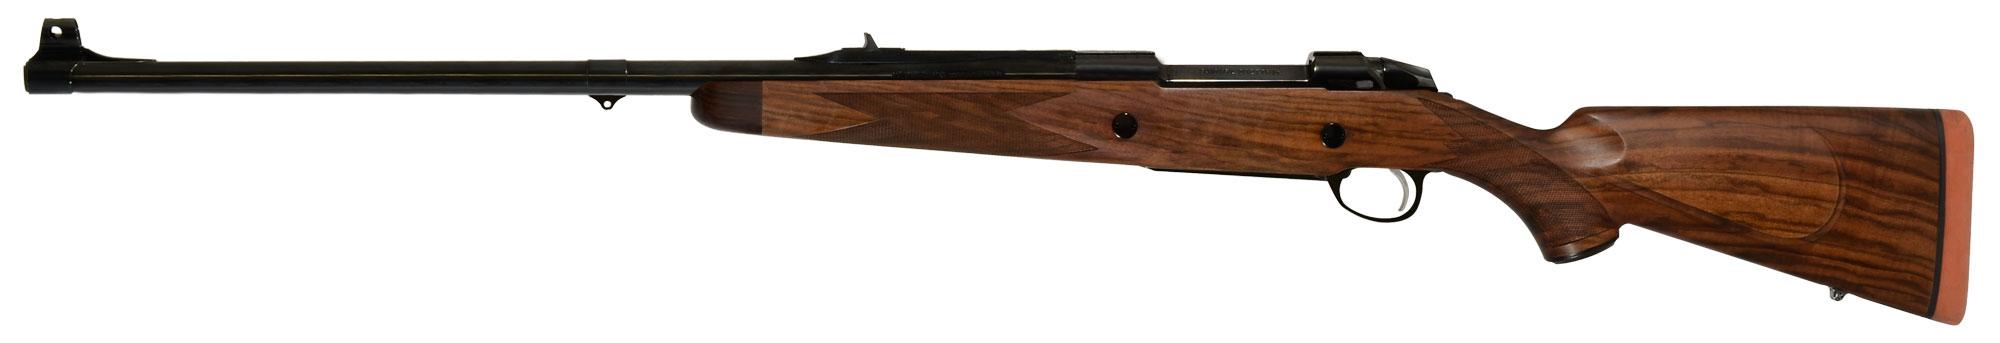 Sako Safari .375 HH Mag Rifle D32778